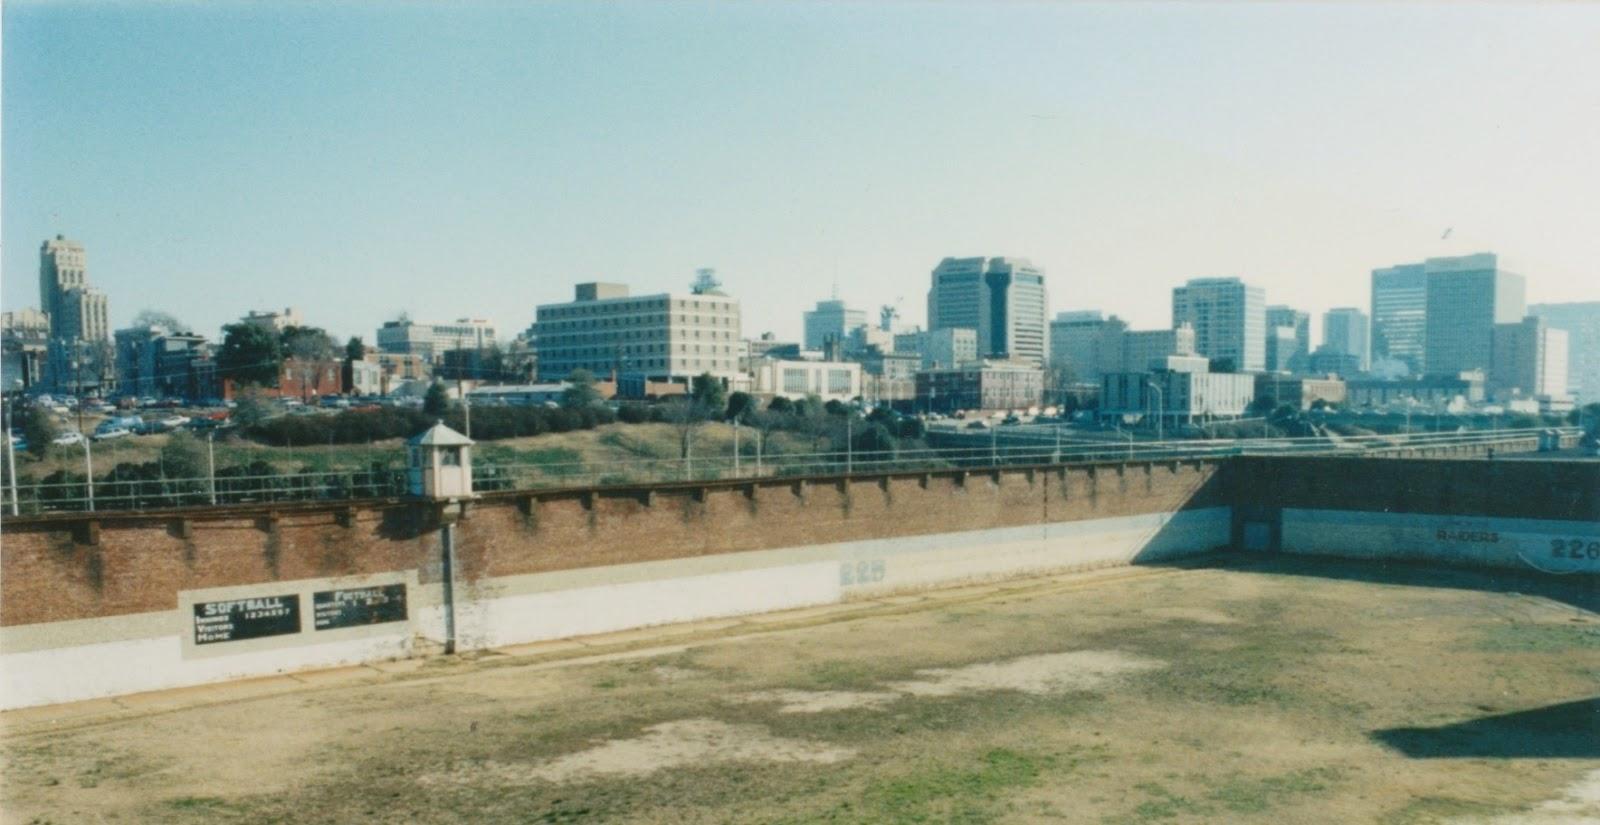 The Virginia Penitentiary In Richmond, January 1991